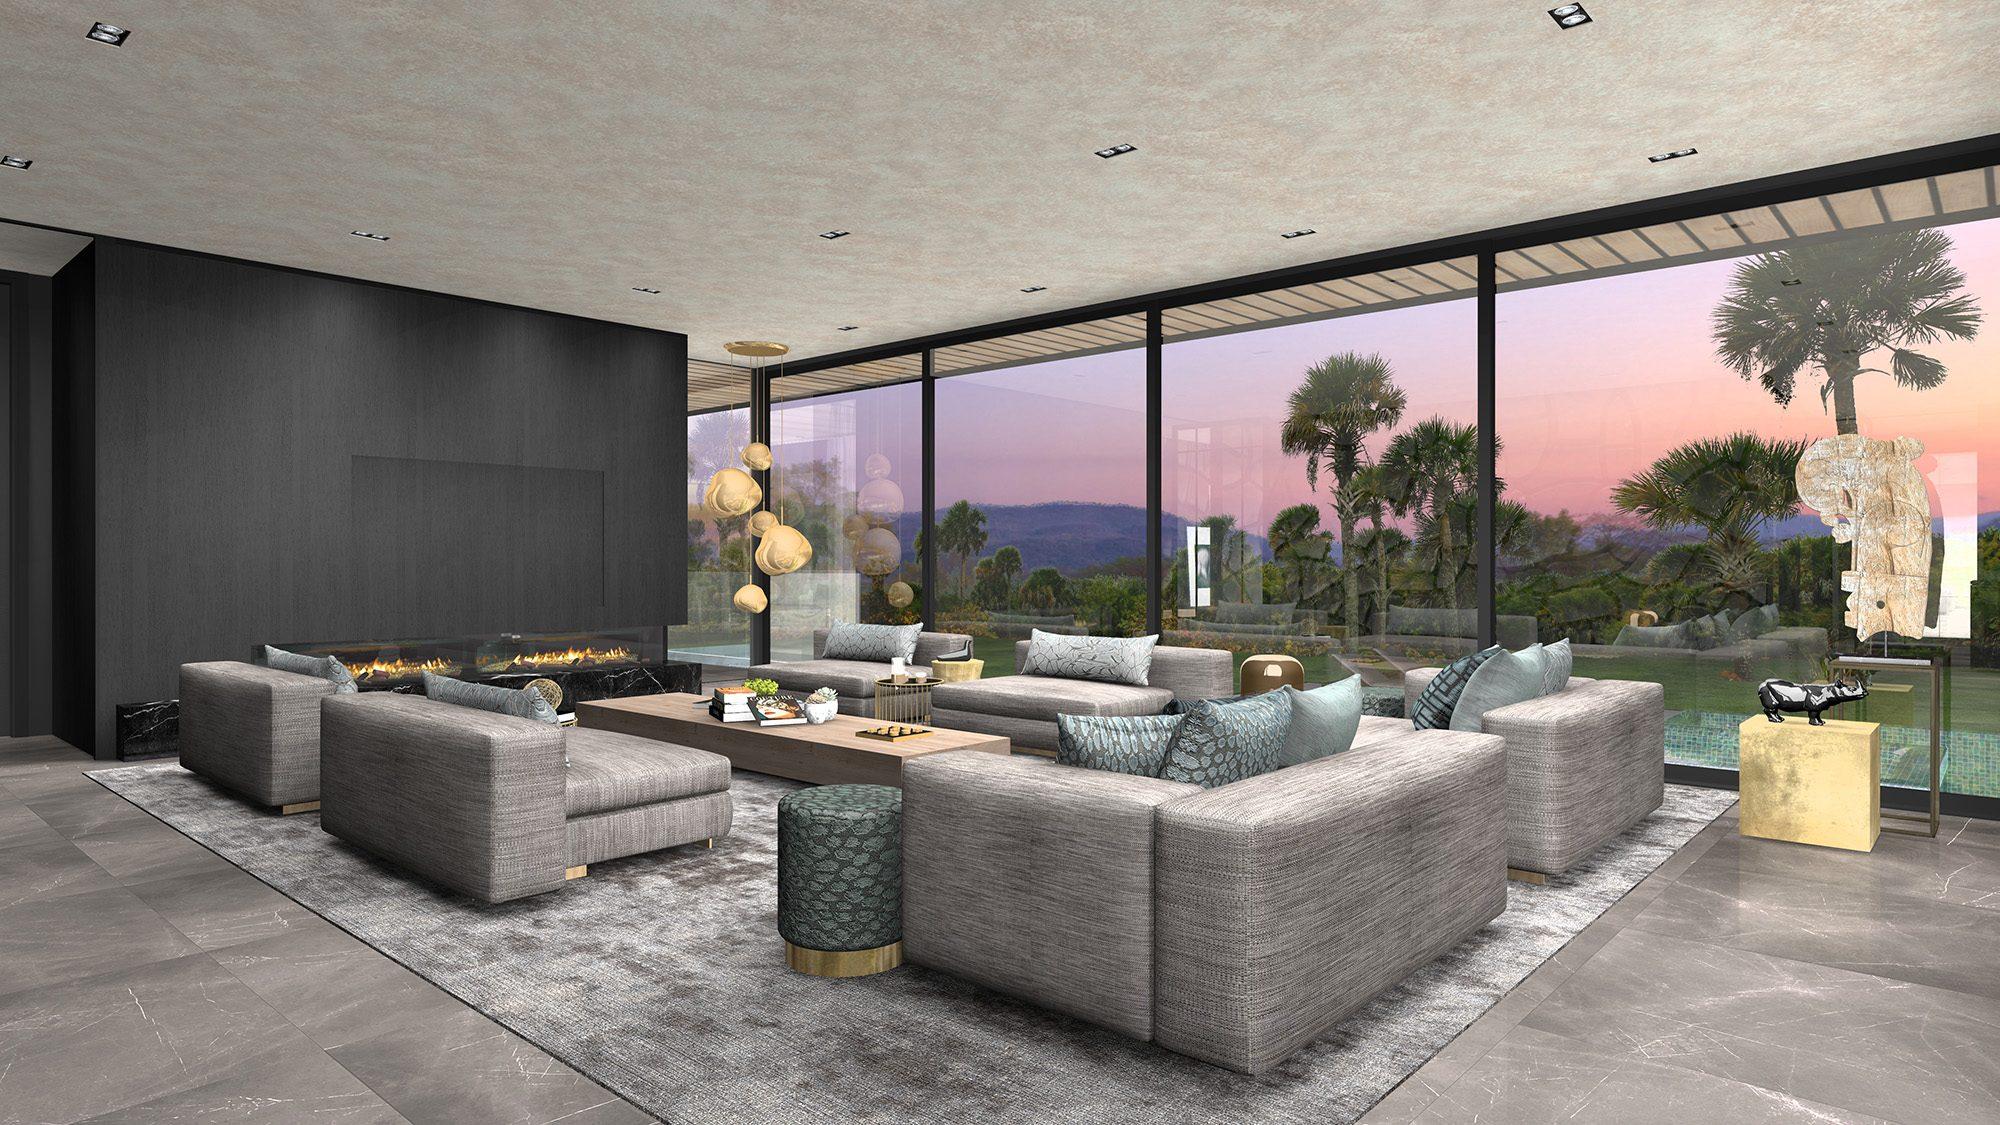 Villa Soho interieur 3D